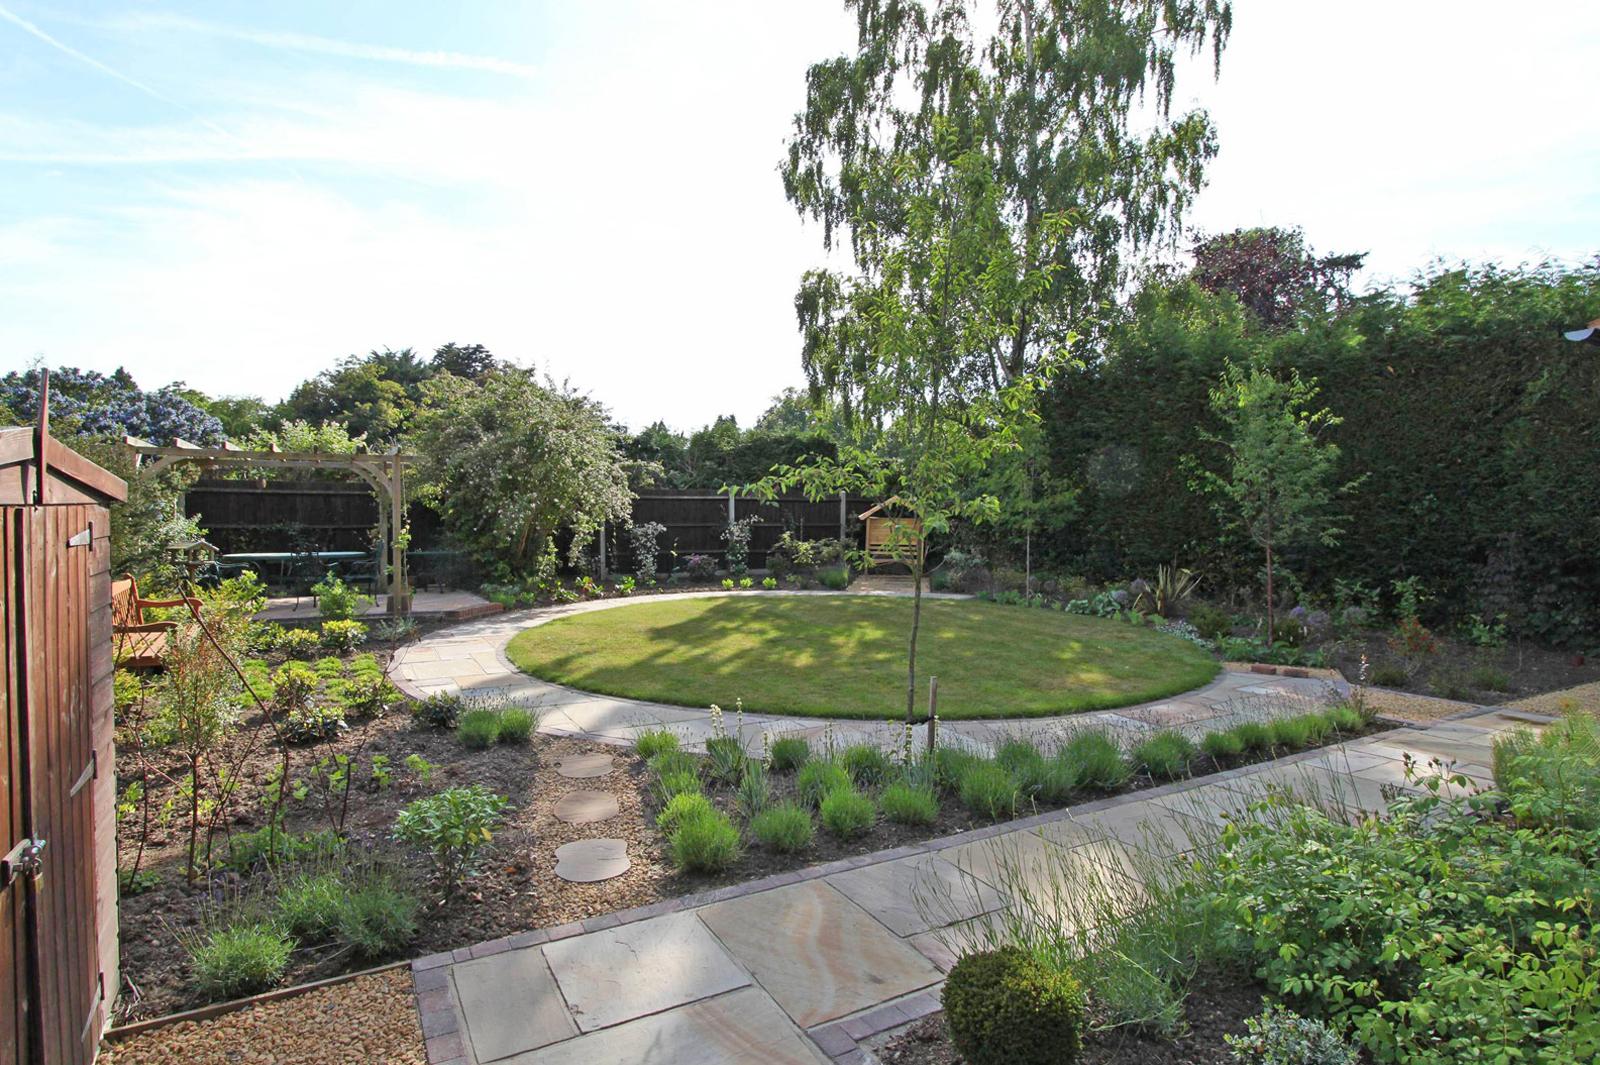 garden-designer-in-Berkshire